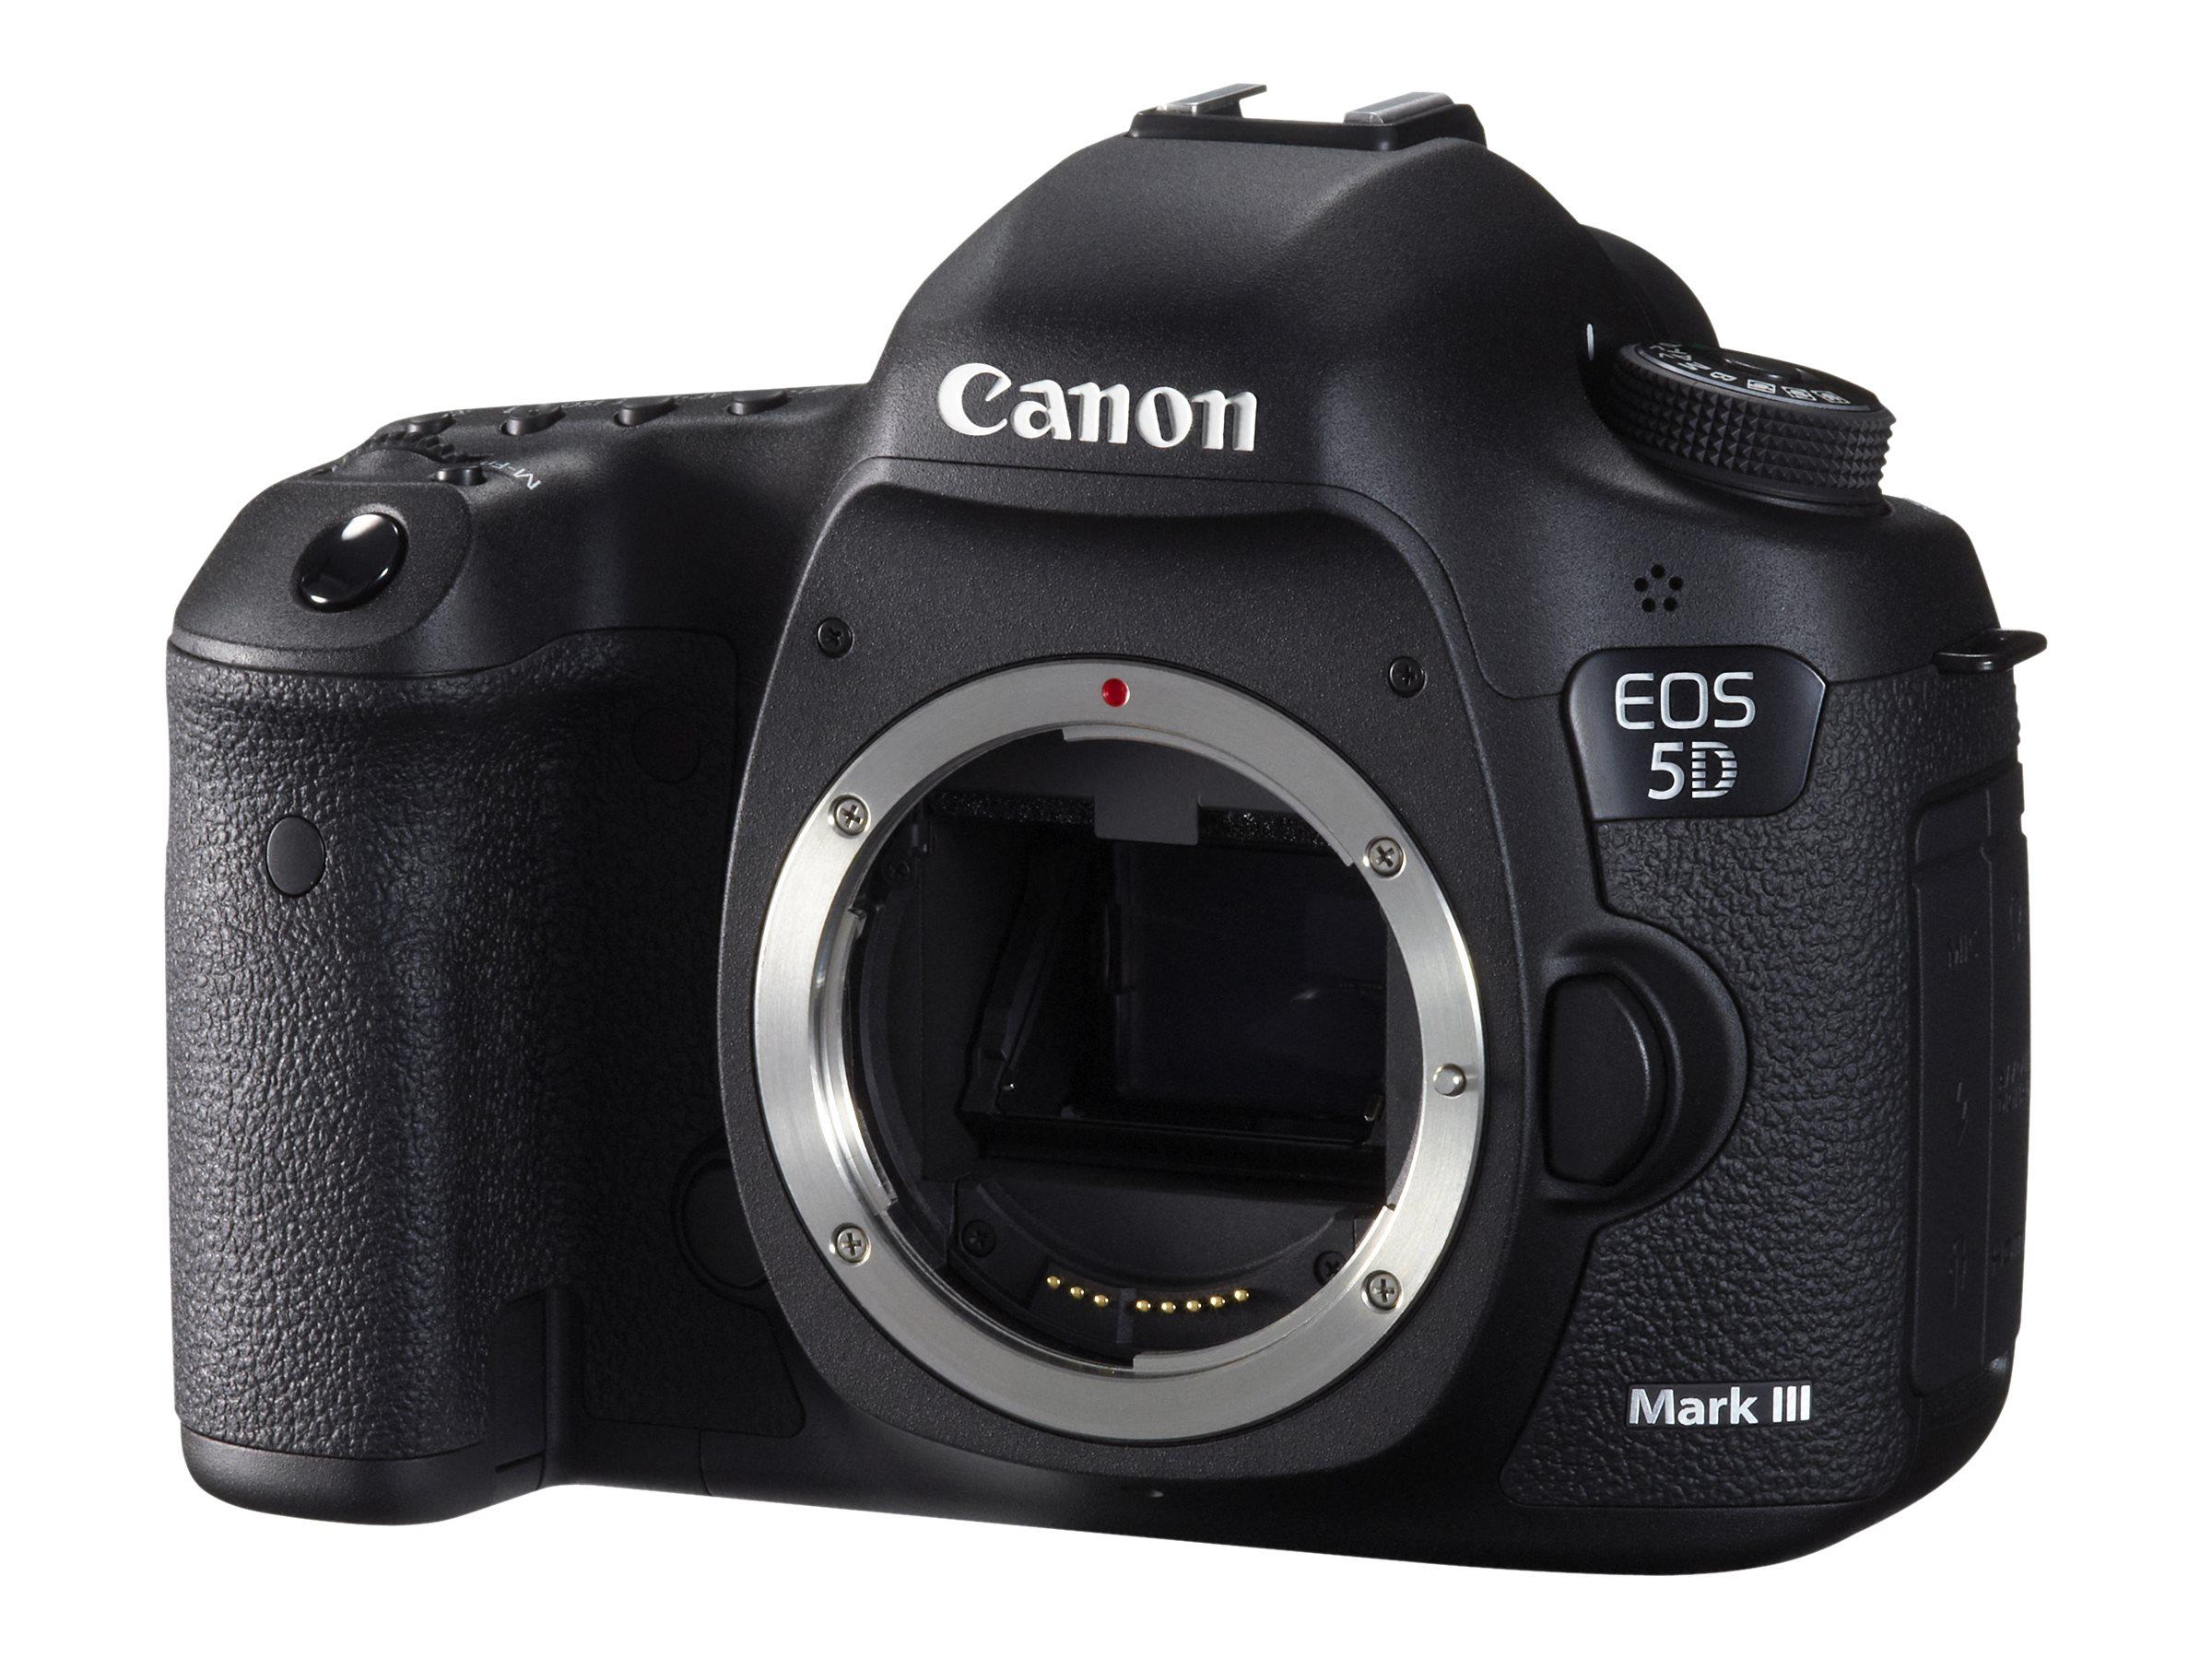 Canon EOS 5D Mark III Digital Camera (Body Only), 5260B002, 13769441, Cameras - Digital